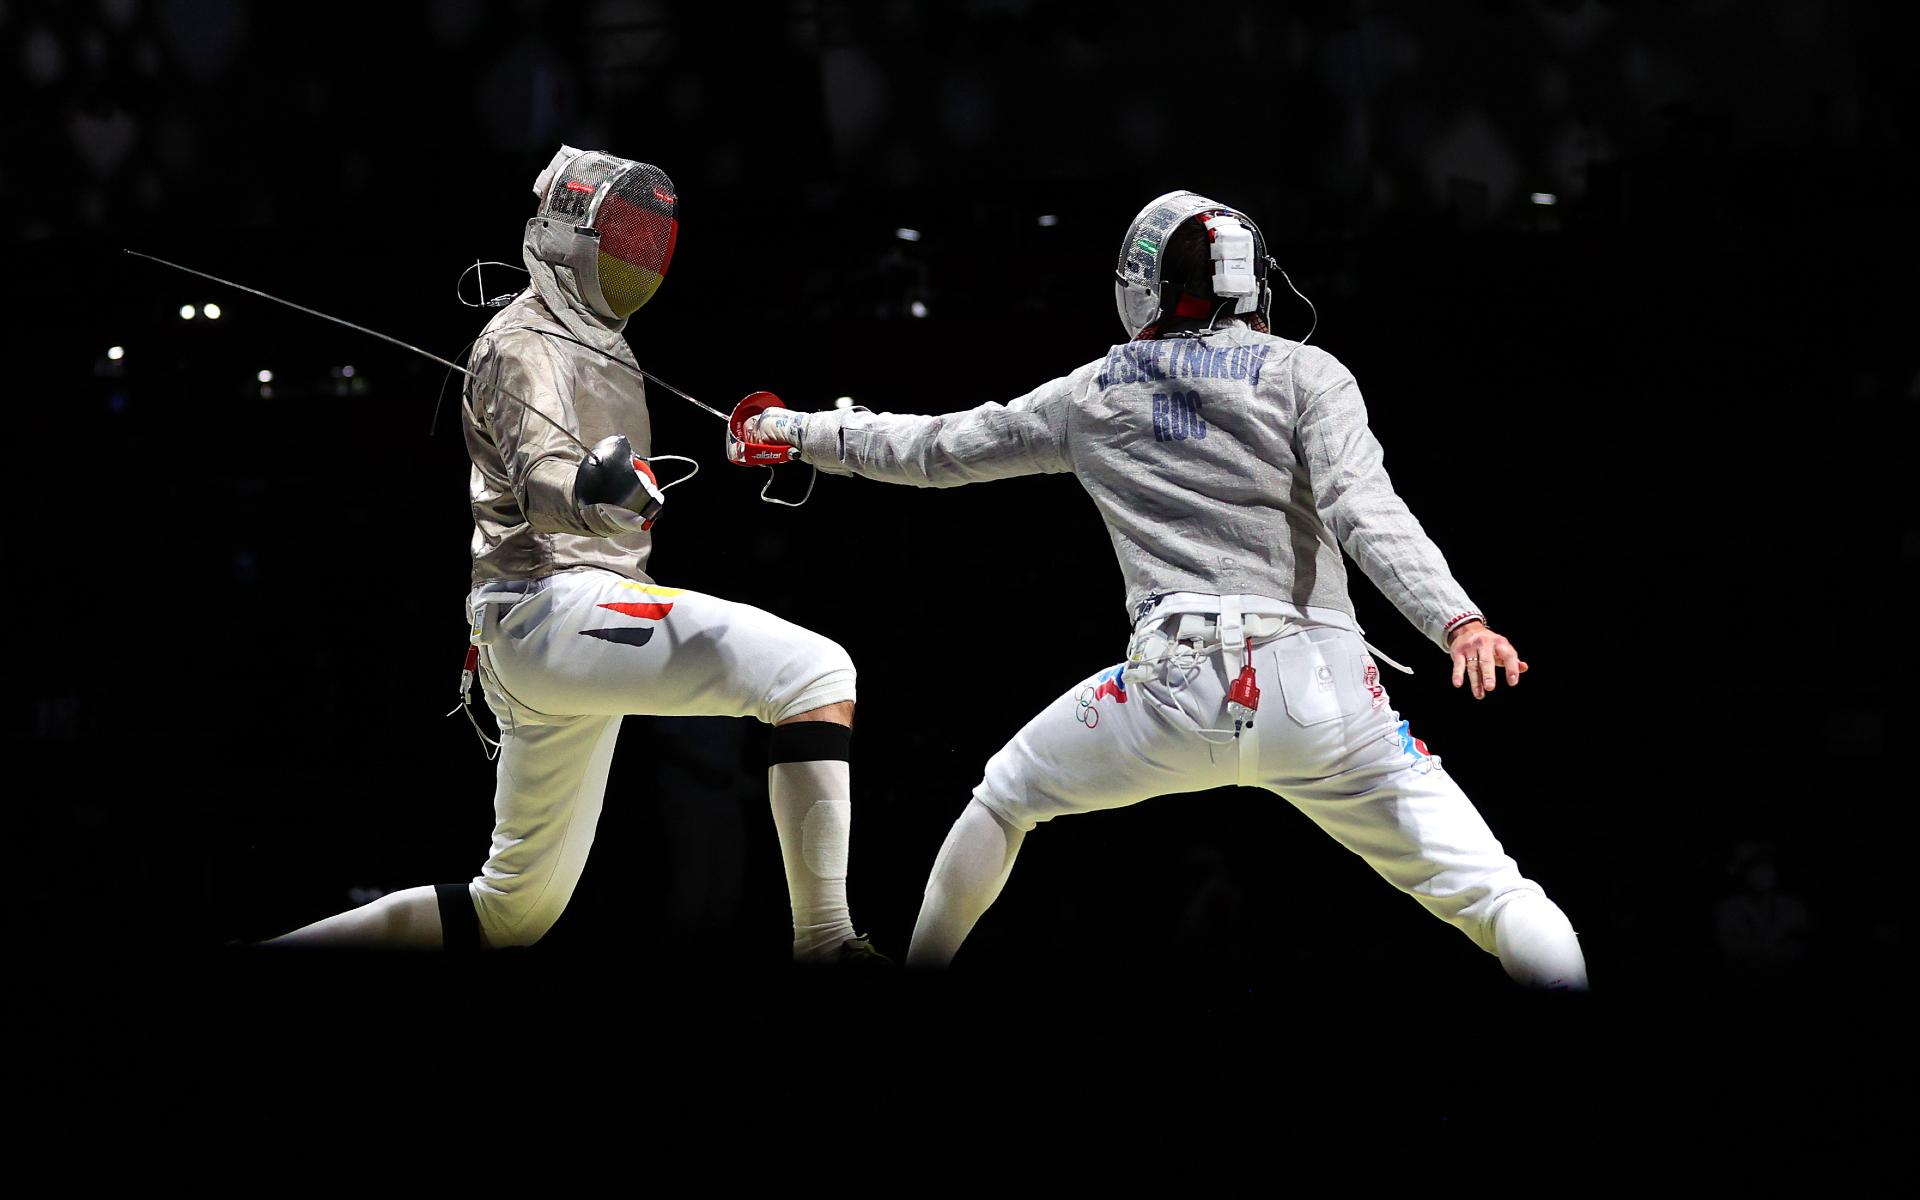 Фото: Вениамин Решетников против немца Бенедикта Вагнера на Олимпиаде в Токио  (Photo by Patrick Smith/Getty Images)